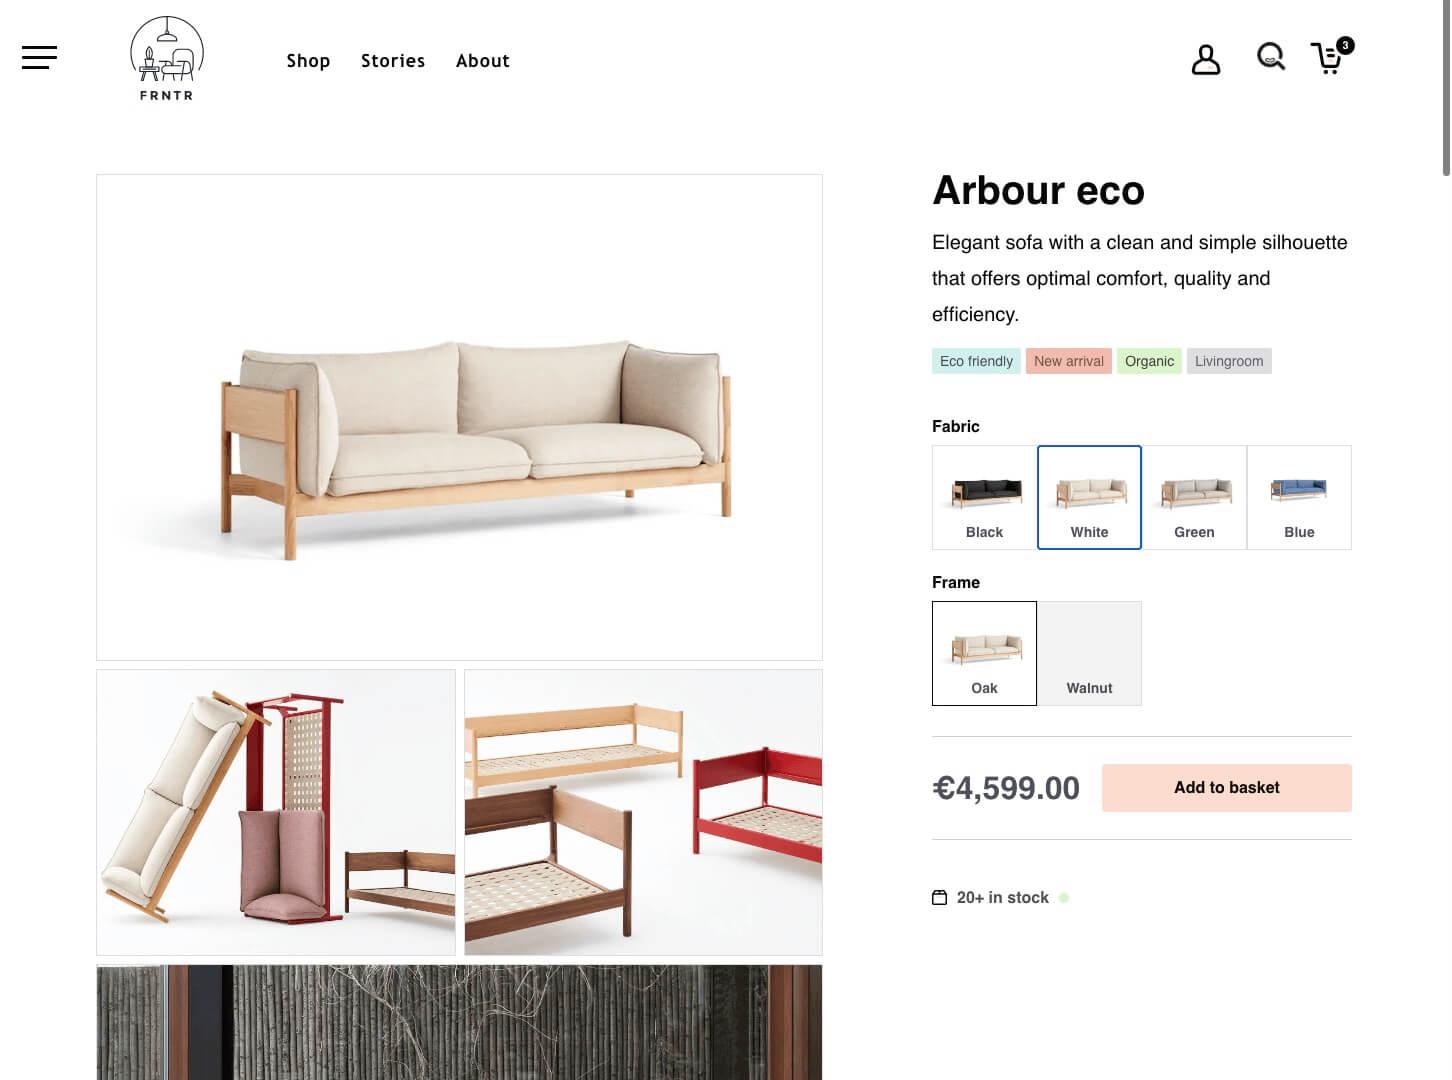 Gatsby eCommerce storefront screenshot